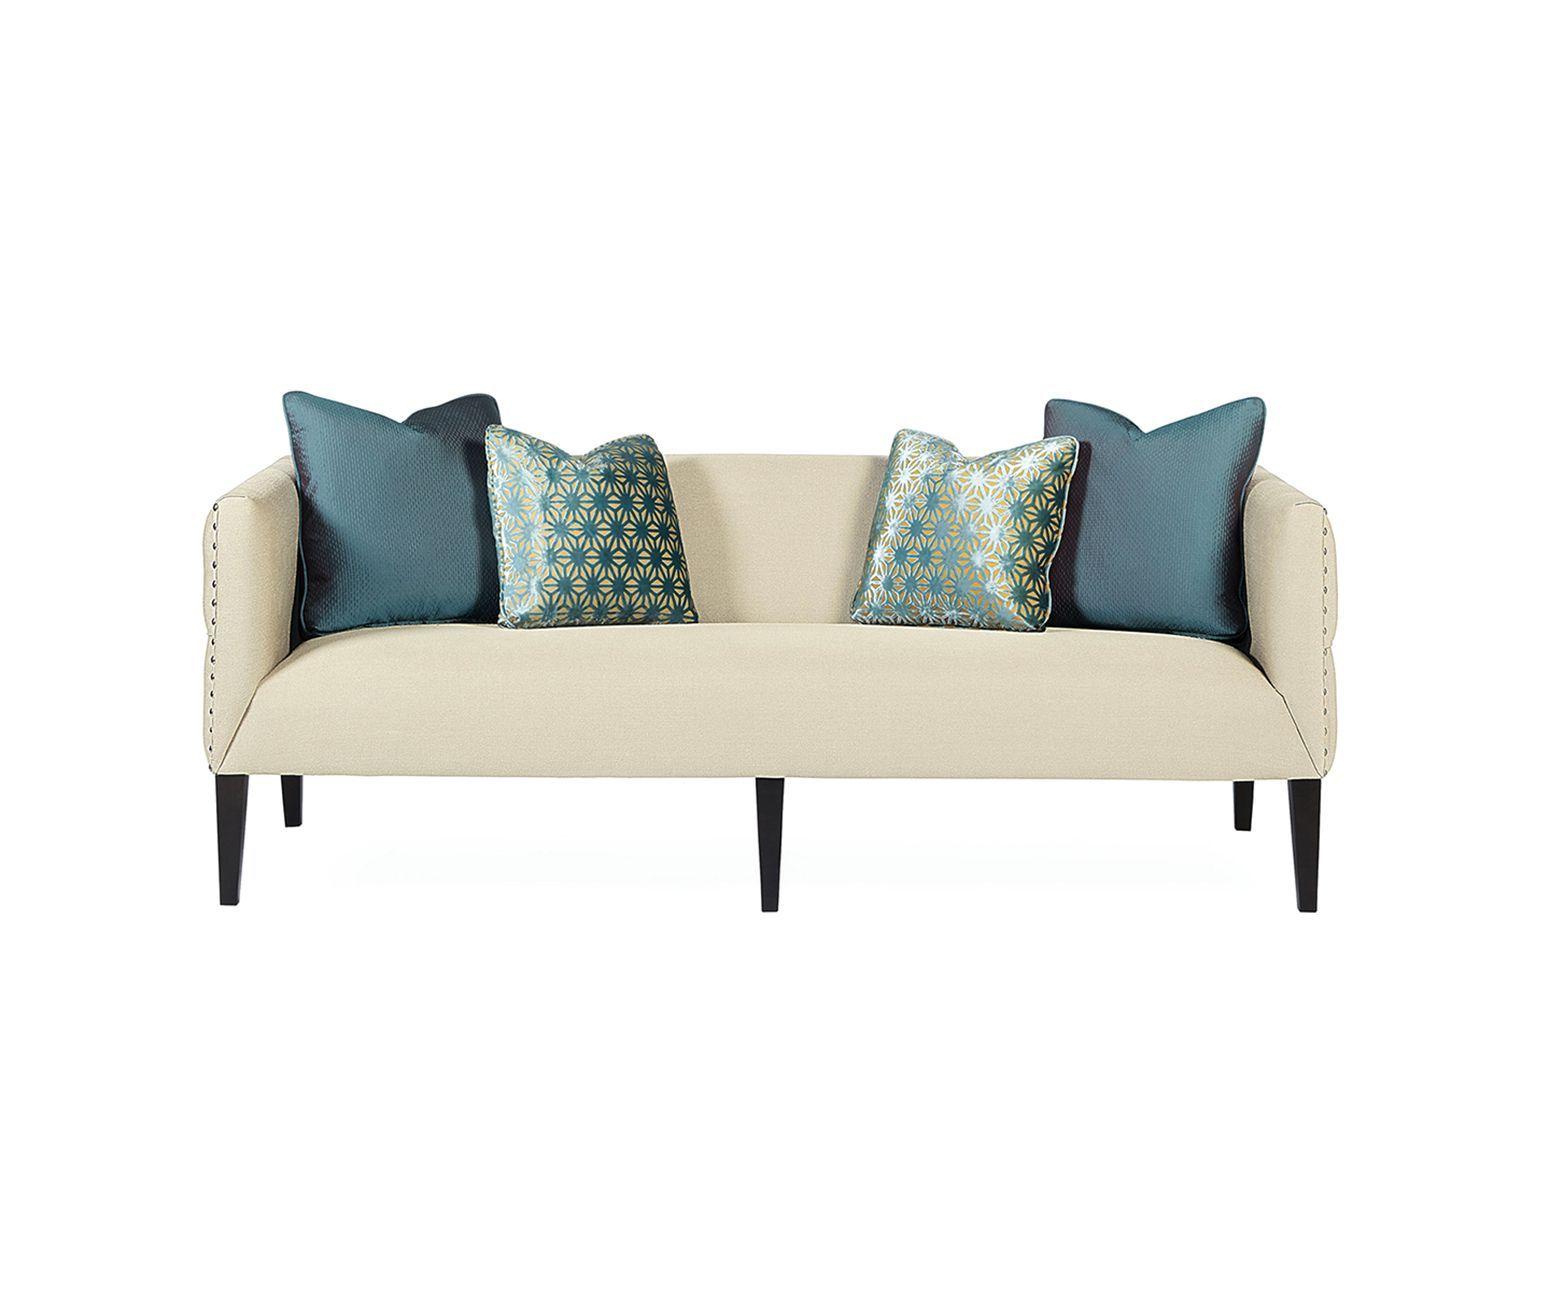 Bernhardt Nora Sofa Collier 39 S Furniture Expo